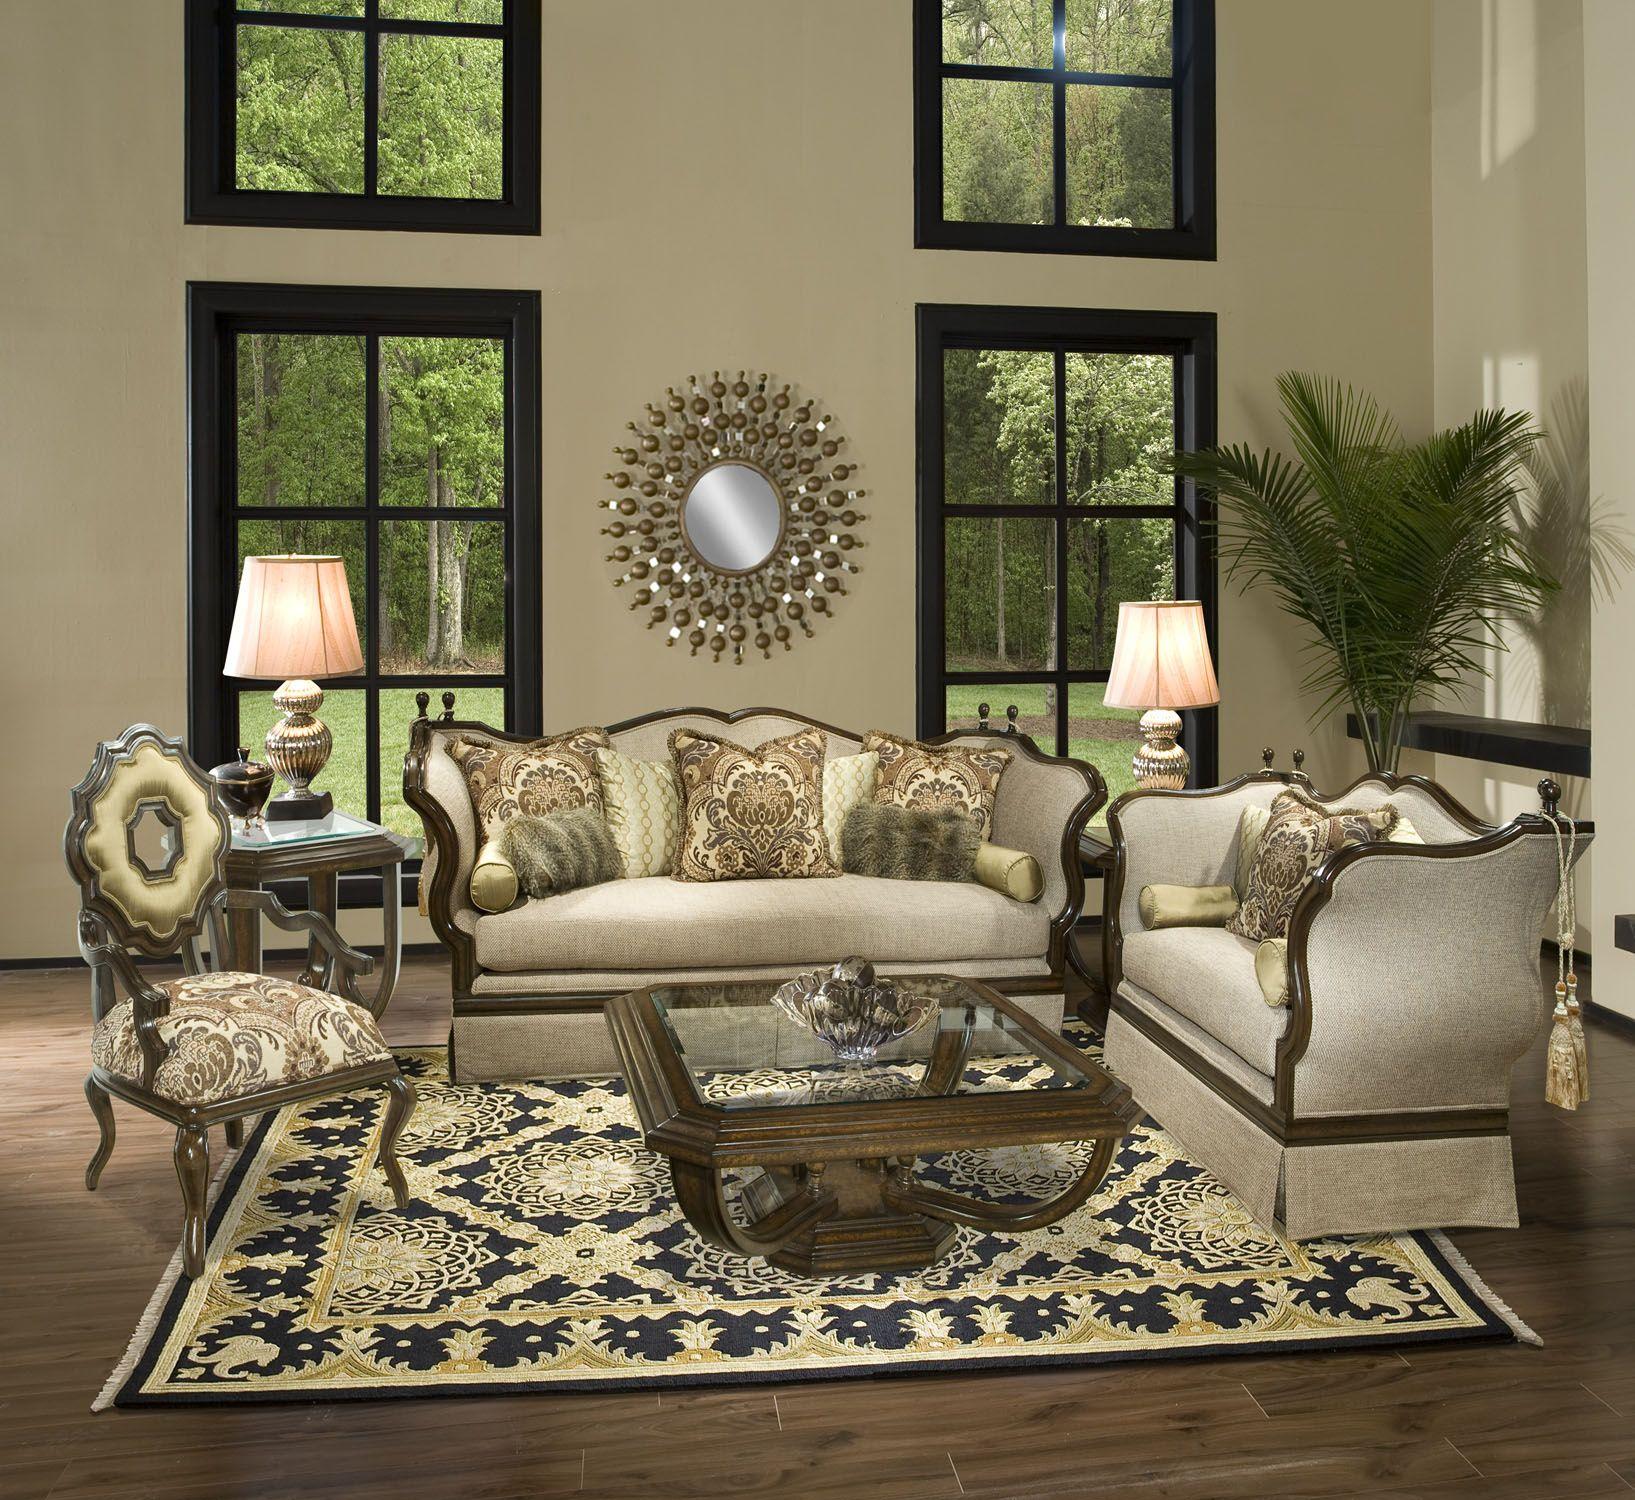 H2P154 411  General Sofa Sets أطقم كنب متنوعة  Pinterest Awesome Italian Living Room Design Inspiration Design